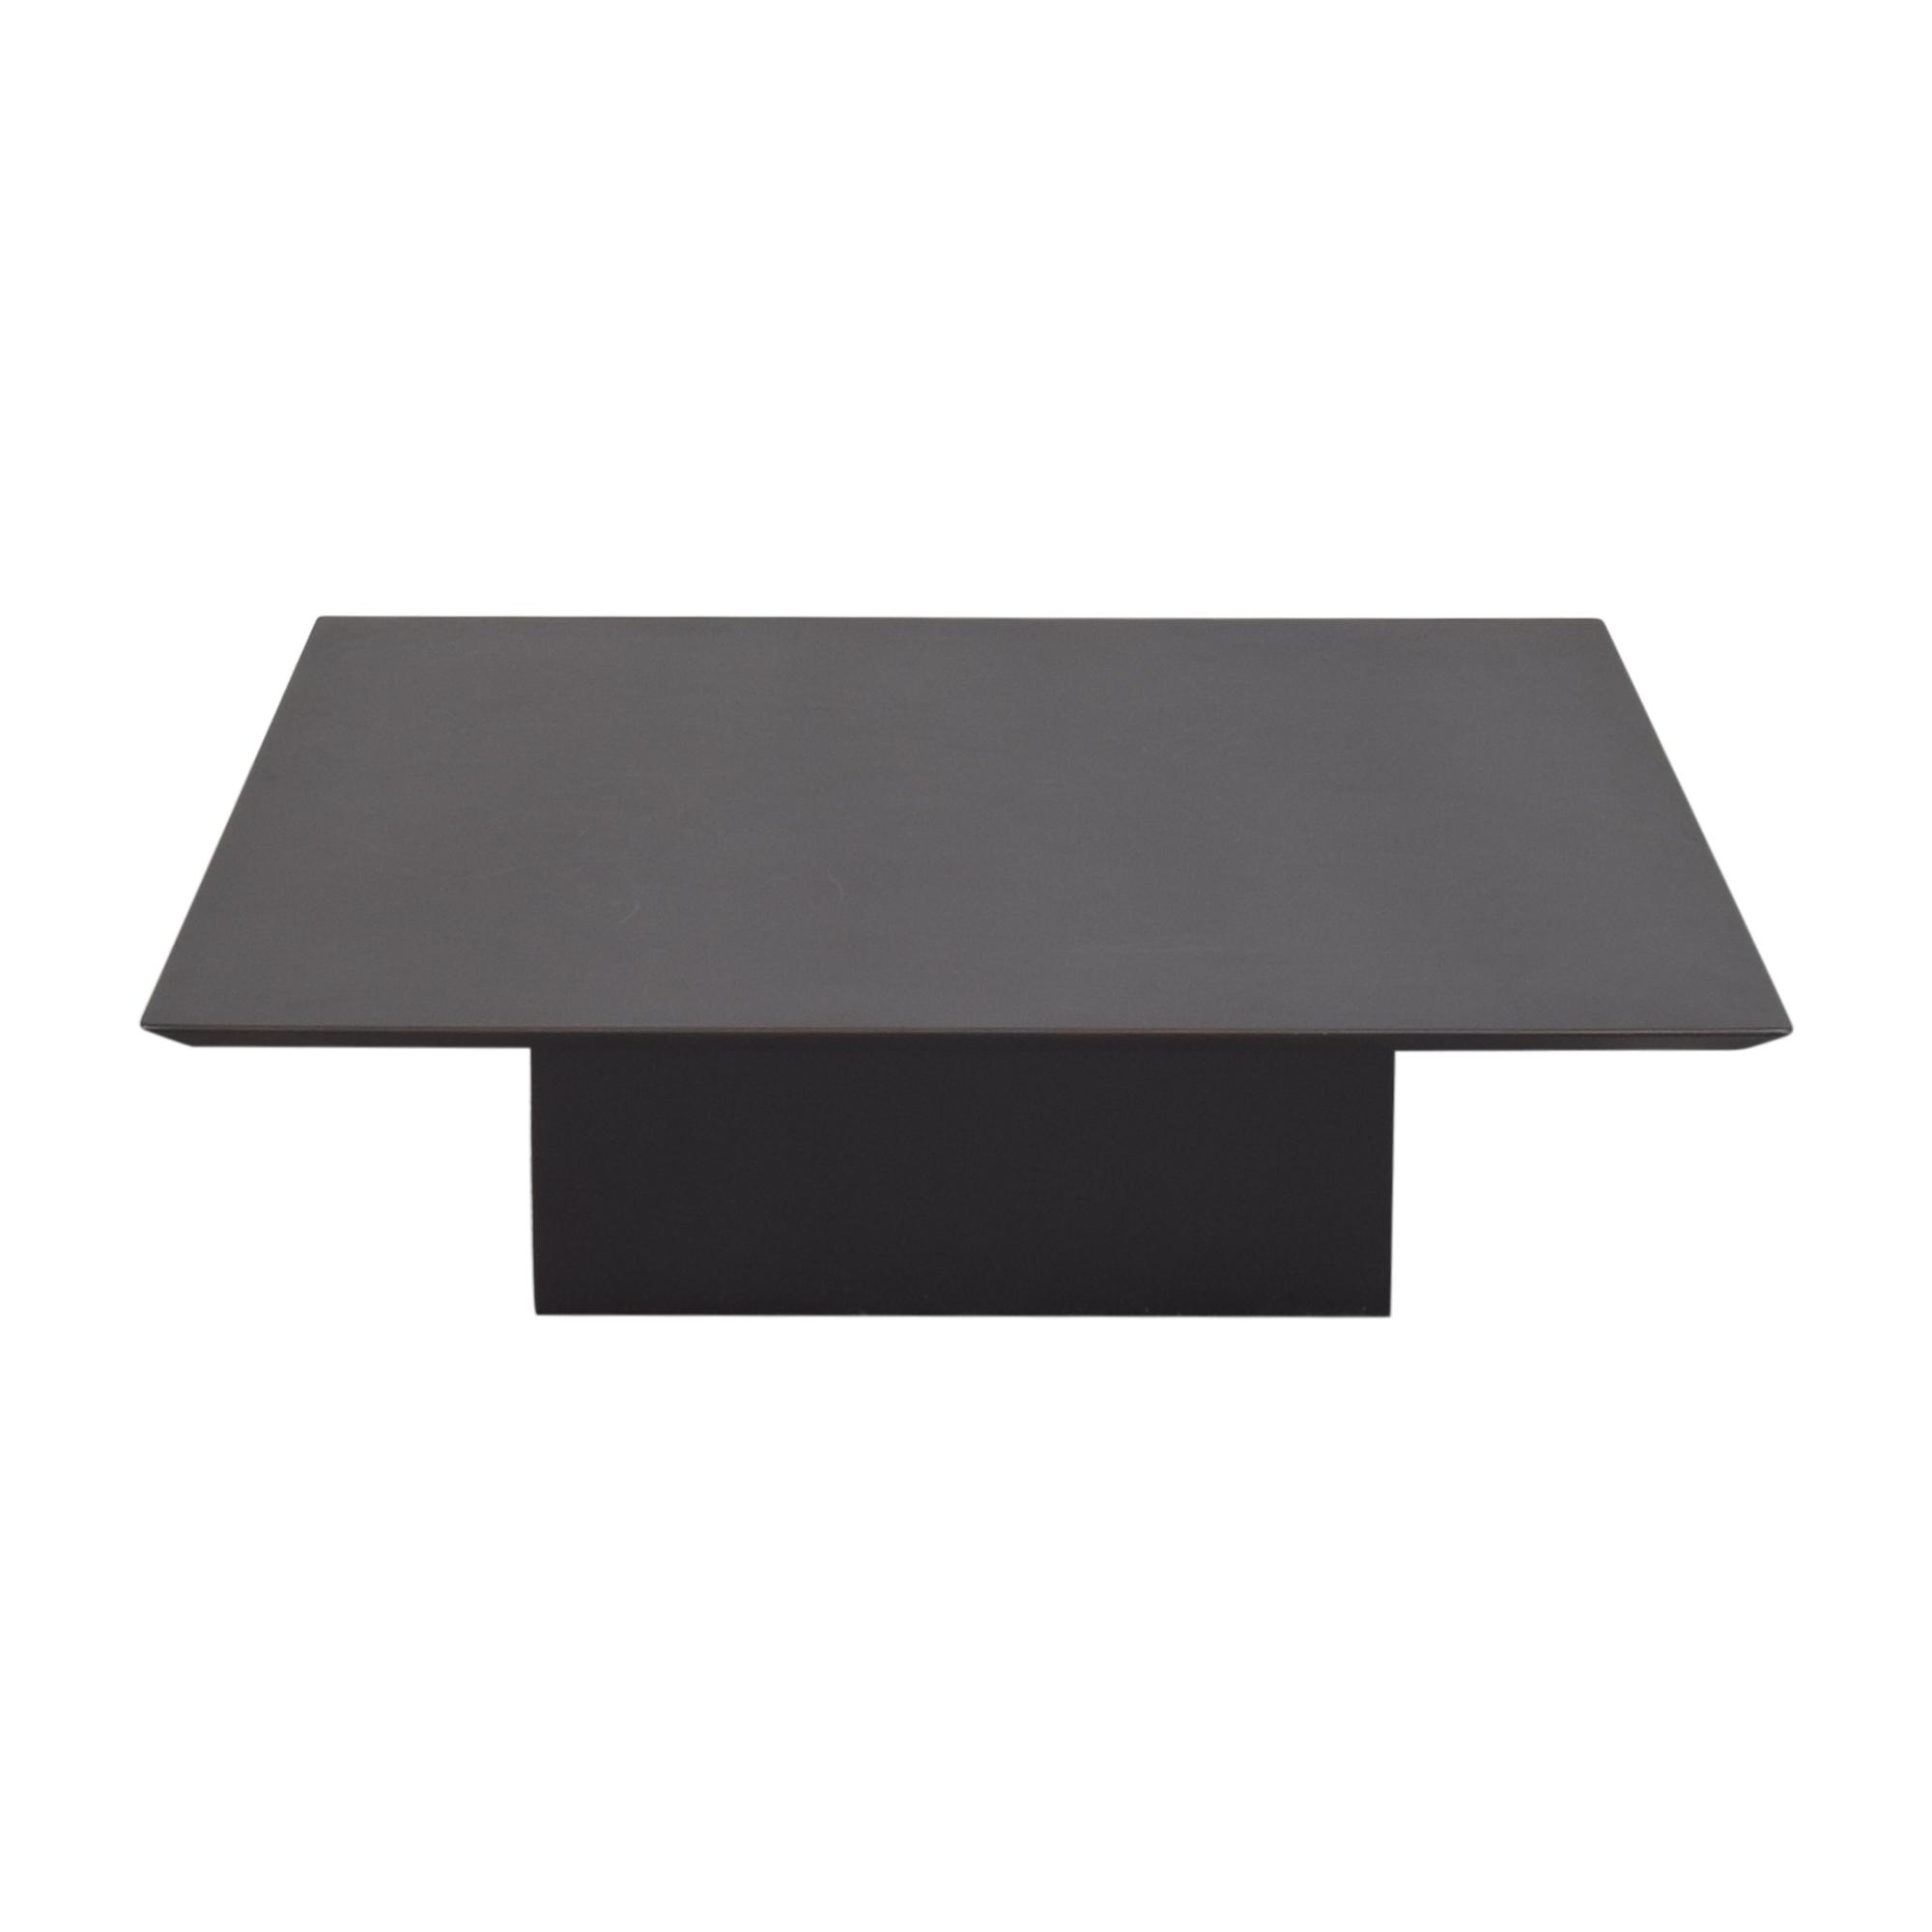 buy Usona Usona Square Coffee Table online